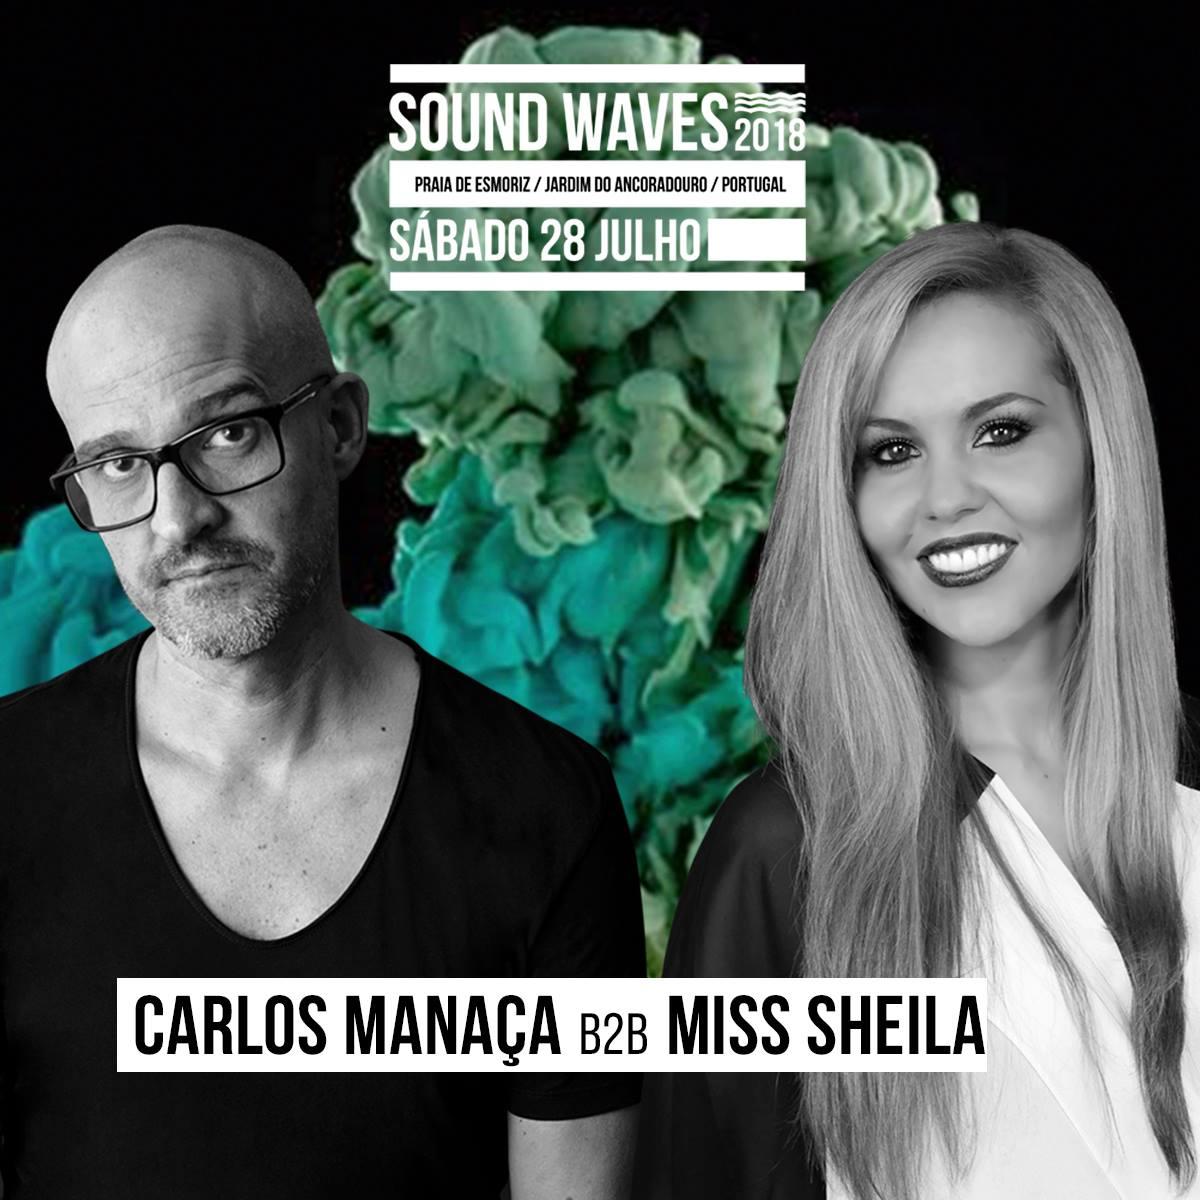 Carlos Manaça b2b Miss Sheila SW 2018